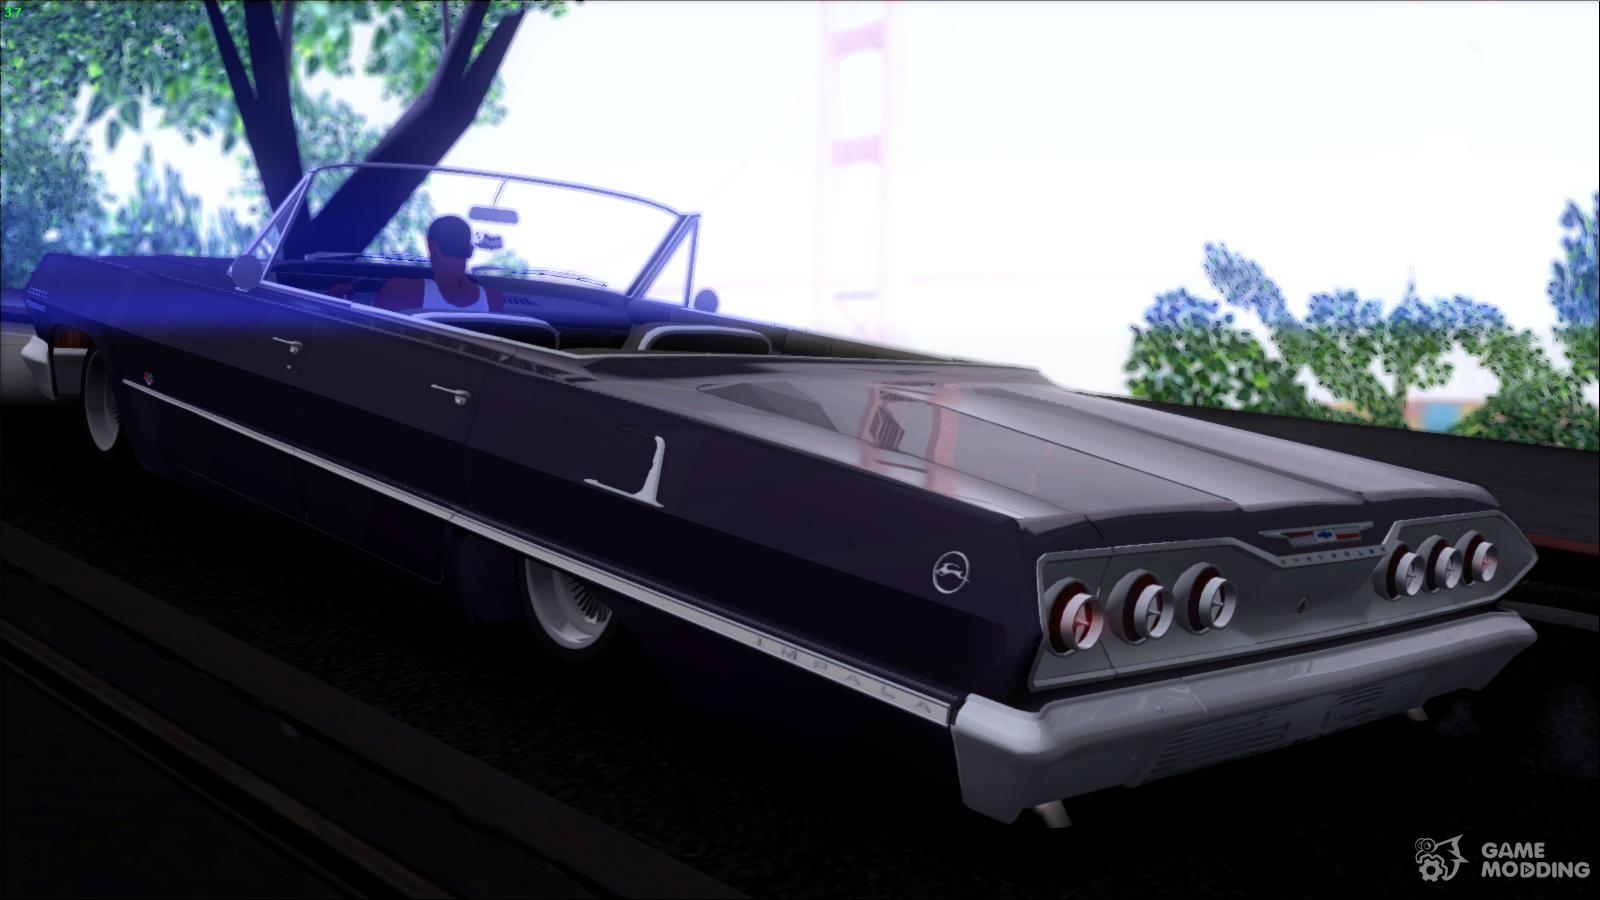 Chevrolet impala 4 door hardtop 1963 for gta san andreas - Chevrolet Impala 1963 For Gta San Andreas Left View